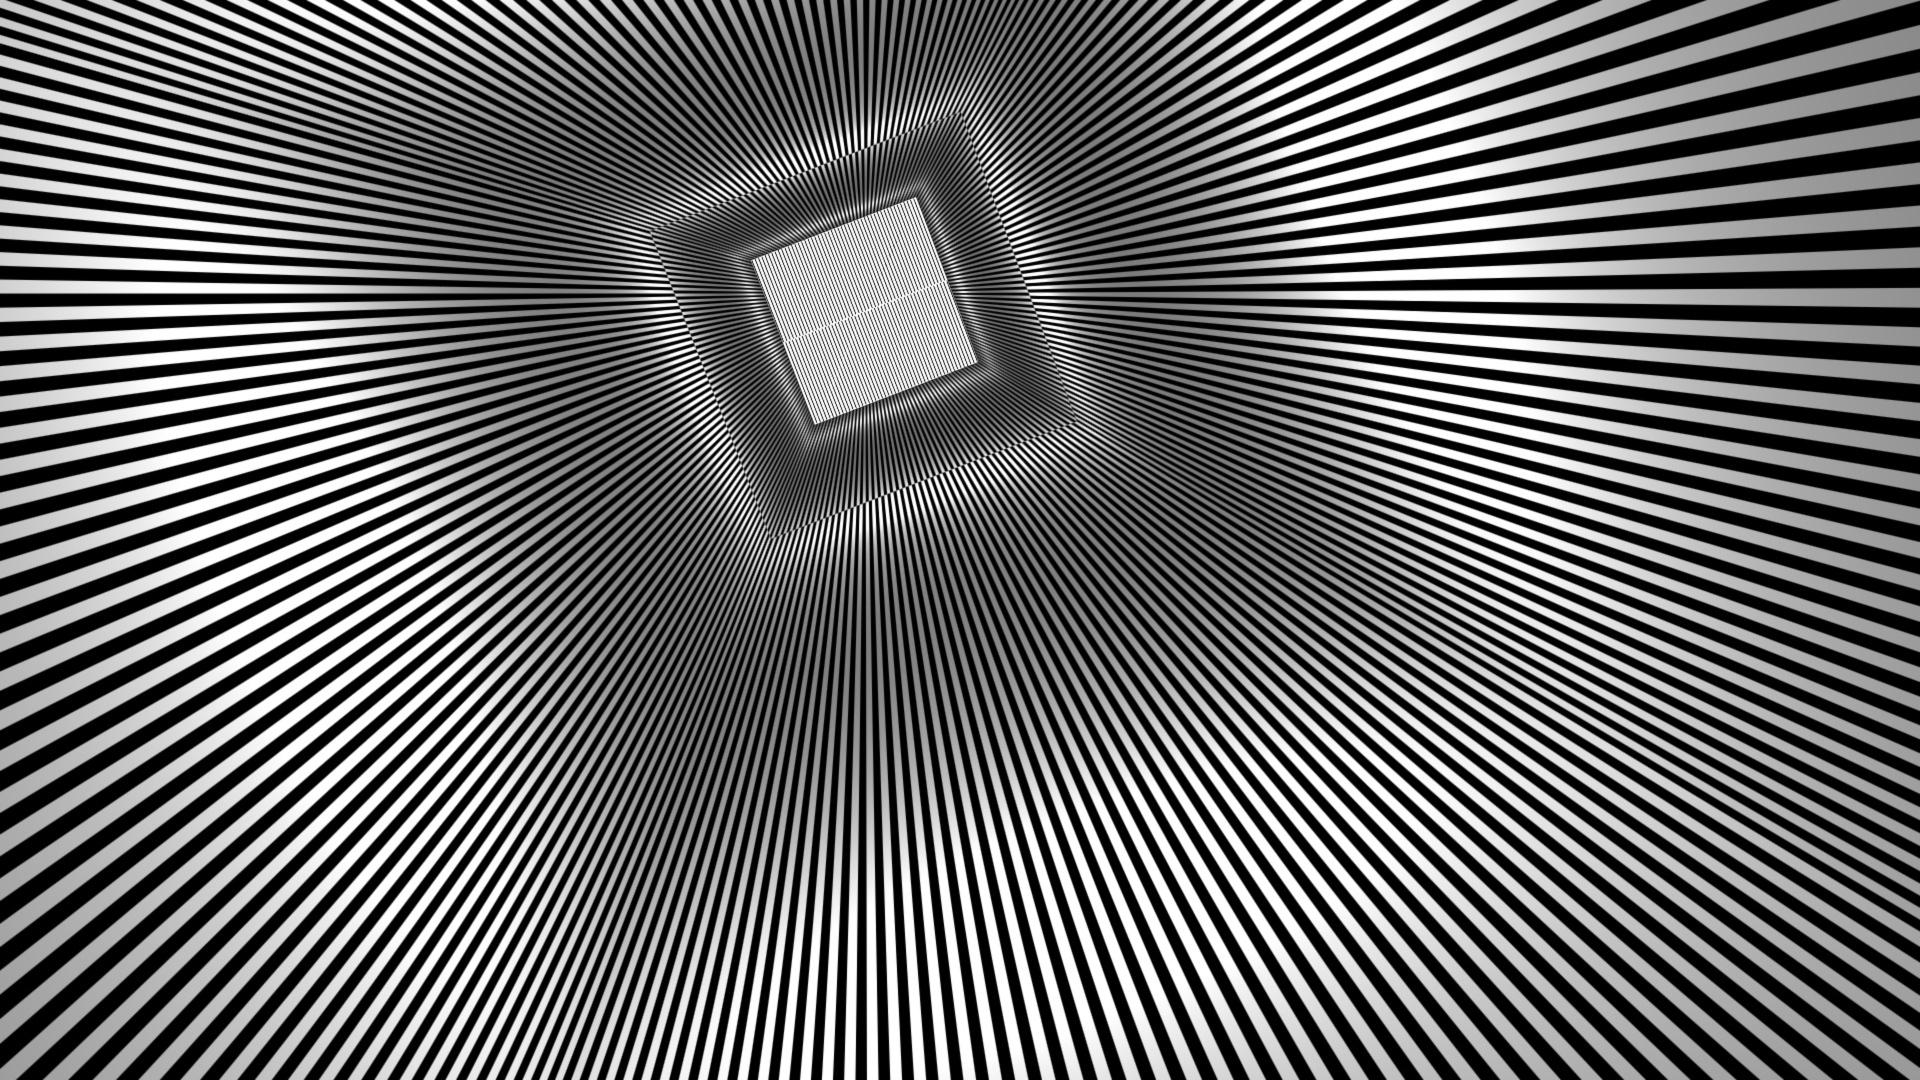 Yellow Iphone Wallpaper Quotes Free Psychedelic Backgrounds Pixelstalk Net